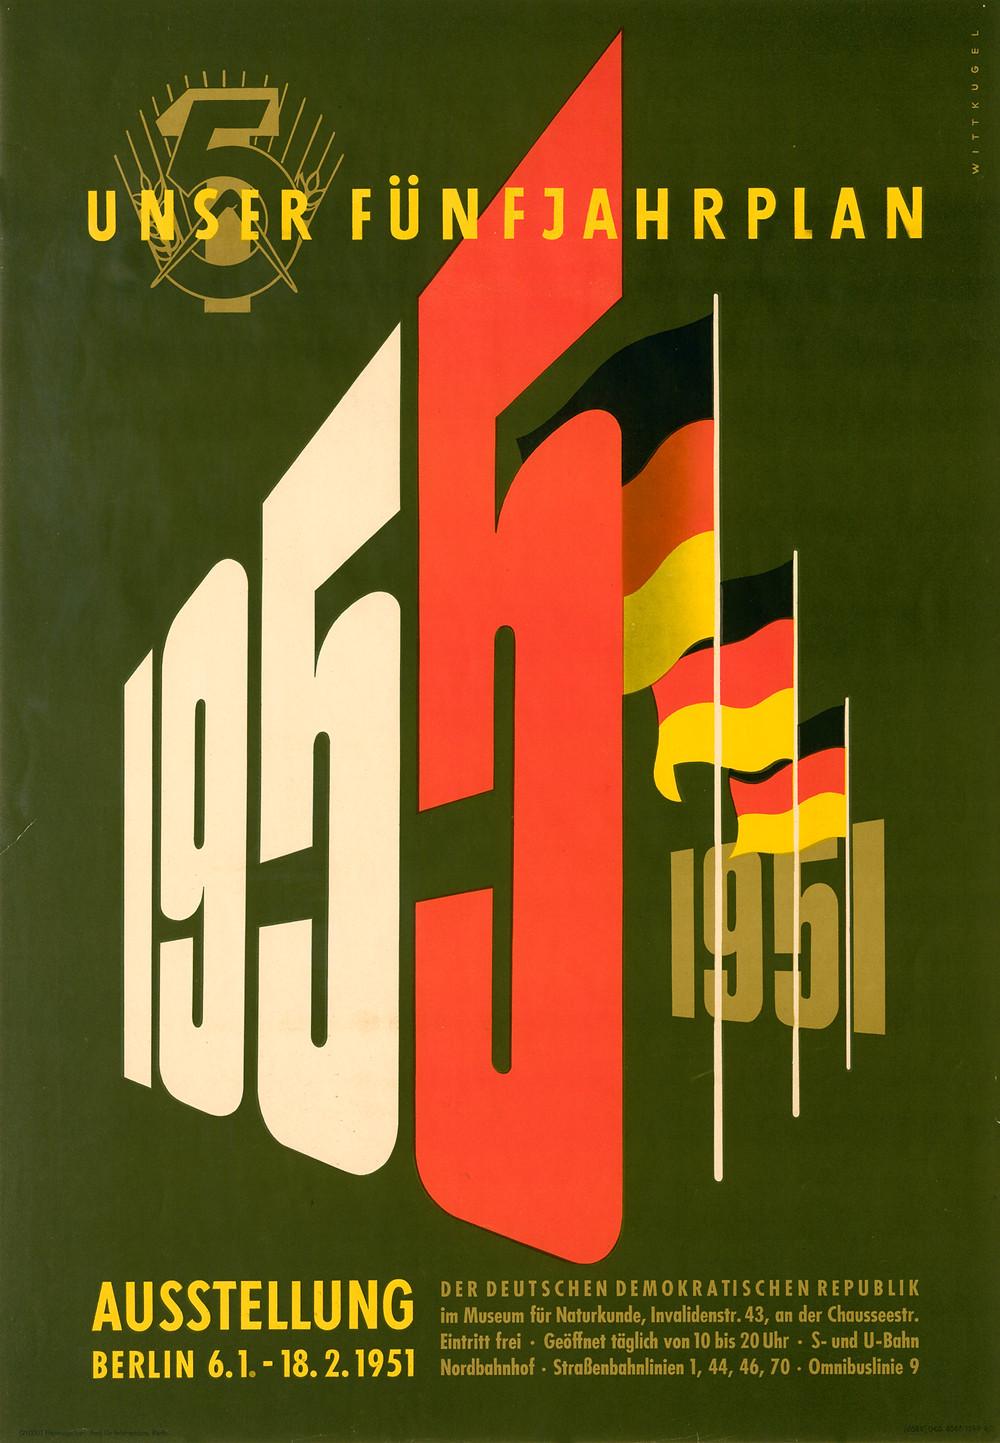 Wittkugel_1950_Fuenfjahrplan